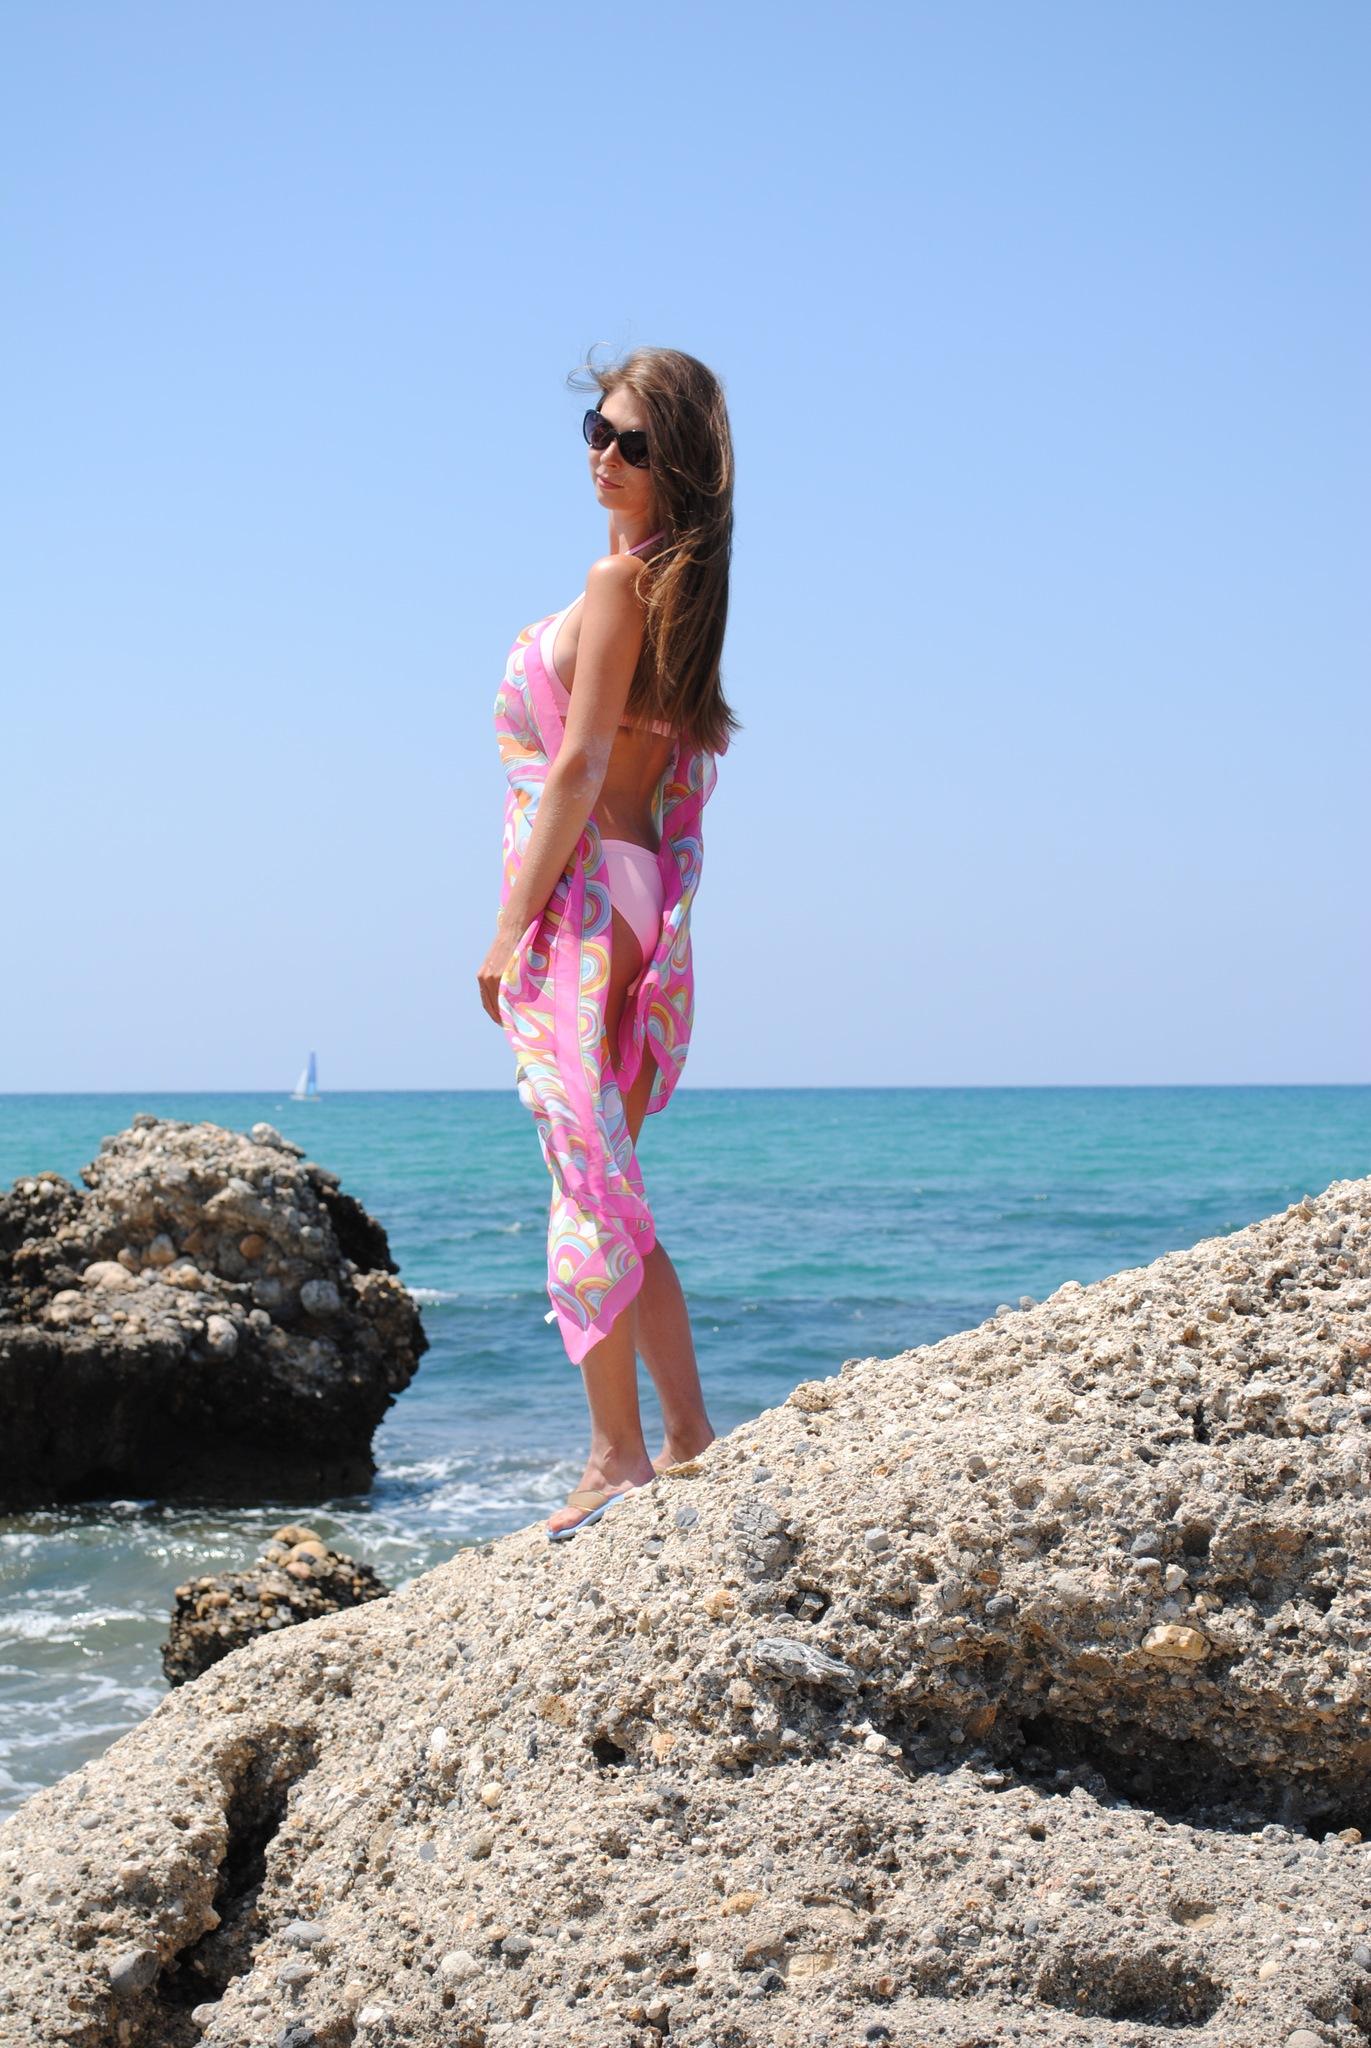 Девушка в розовом купальнике и парео